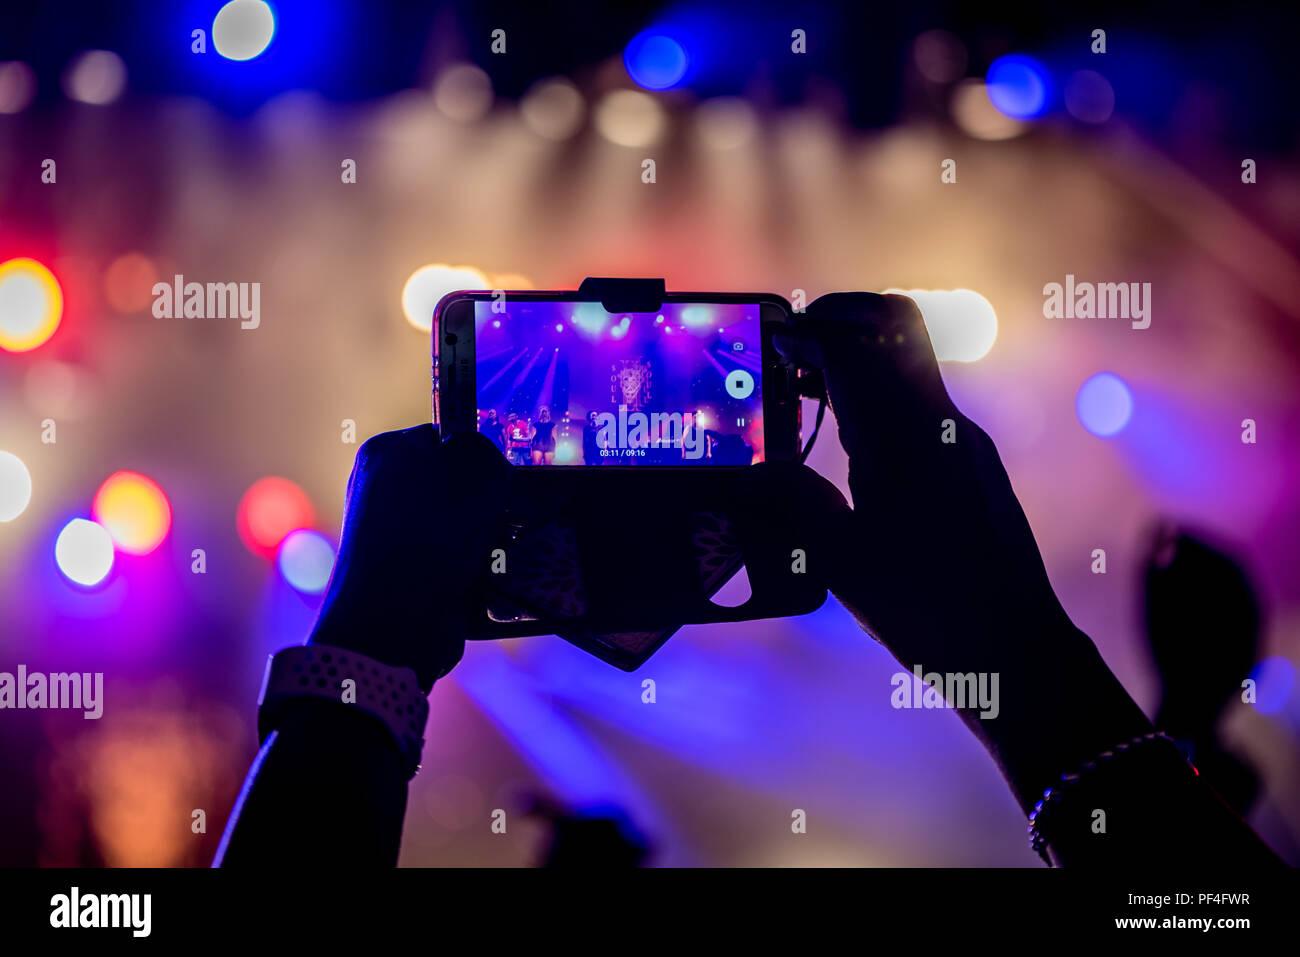 Music Stars Stock Photos & Music Stars Stock Images - Alamy